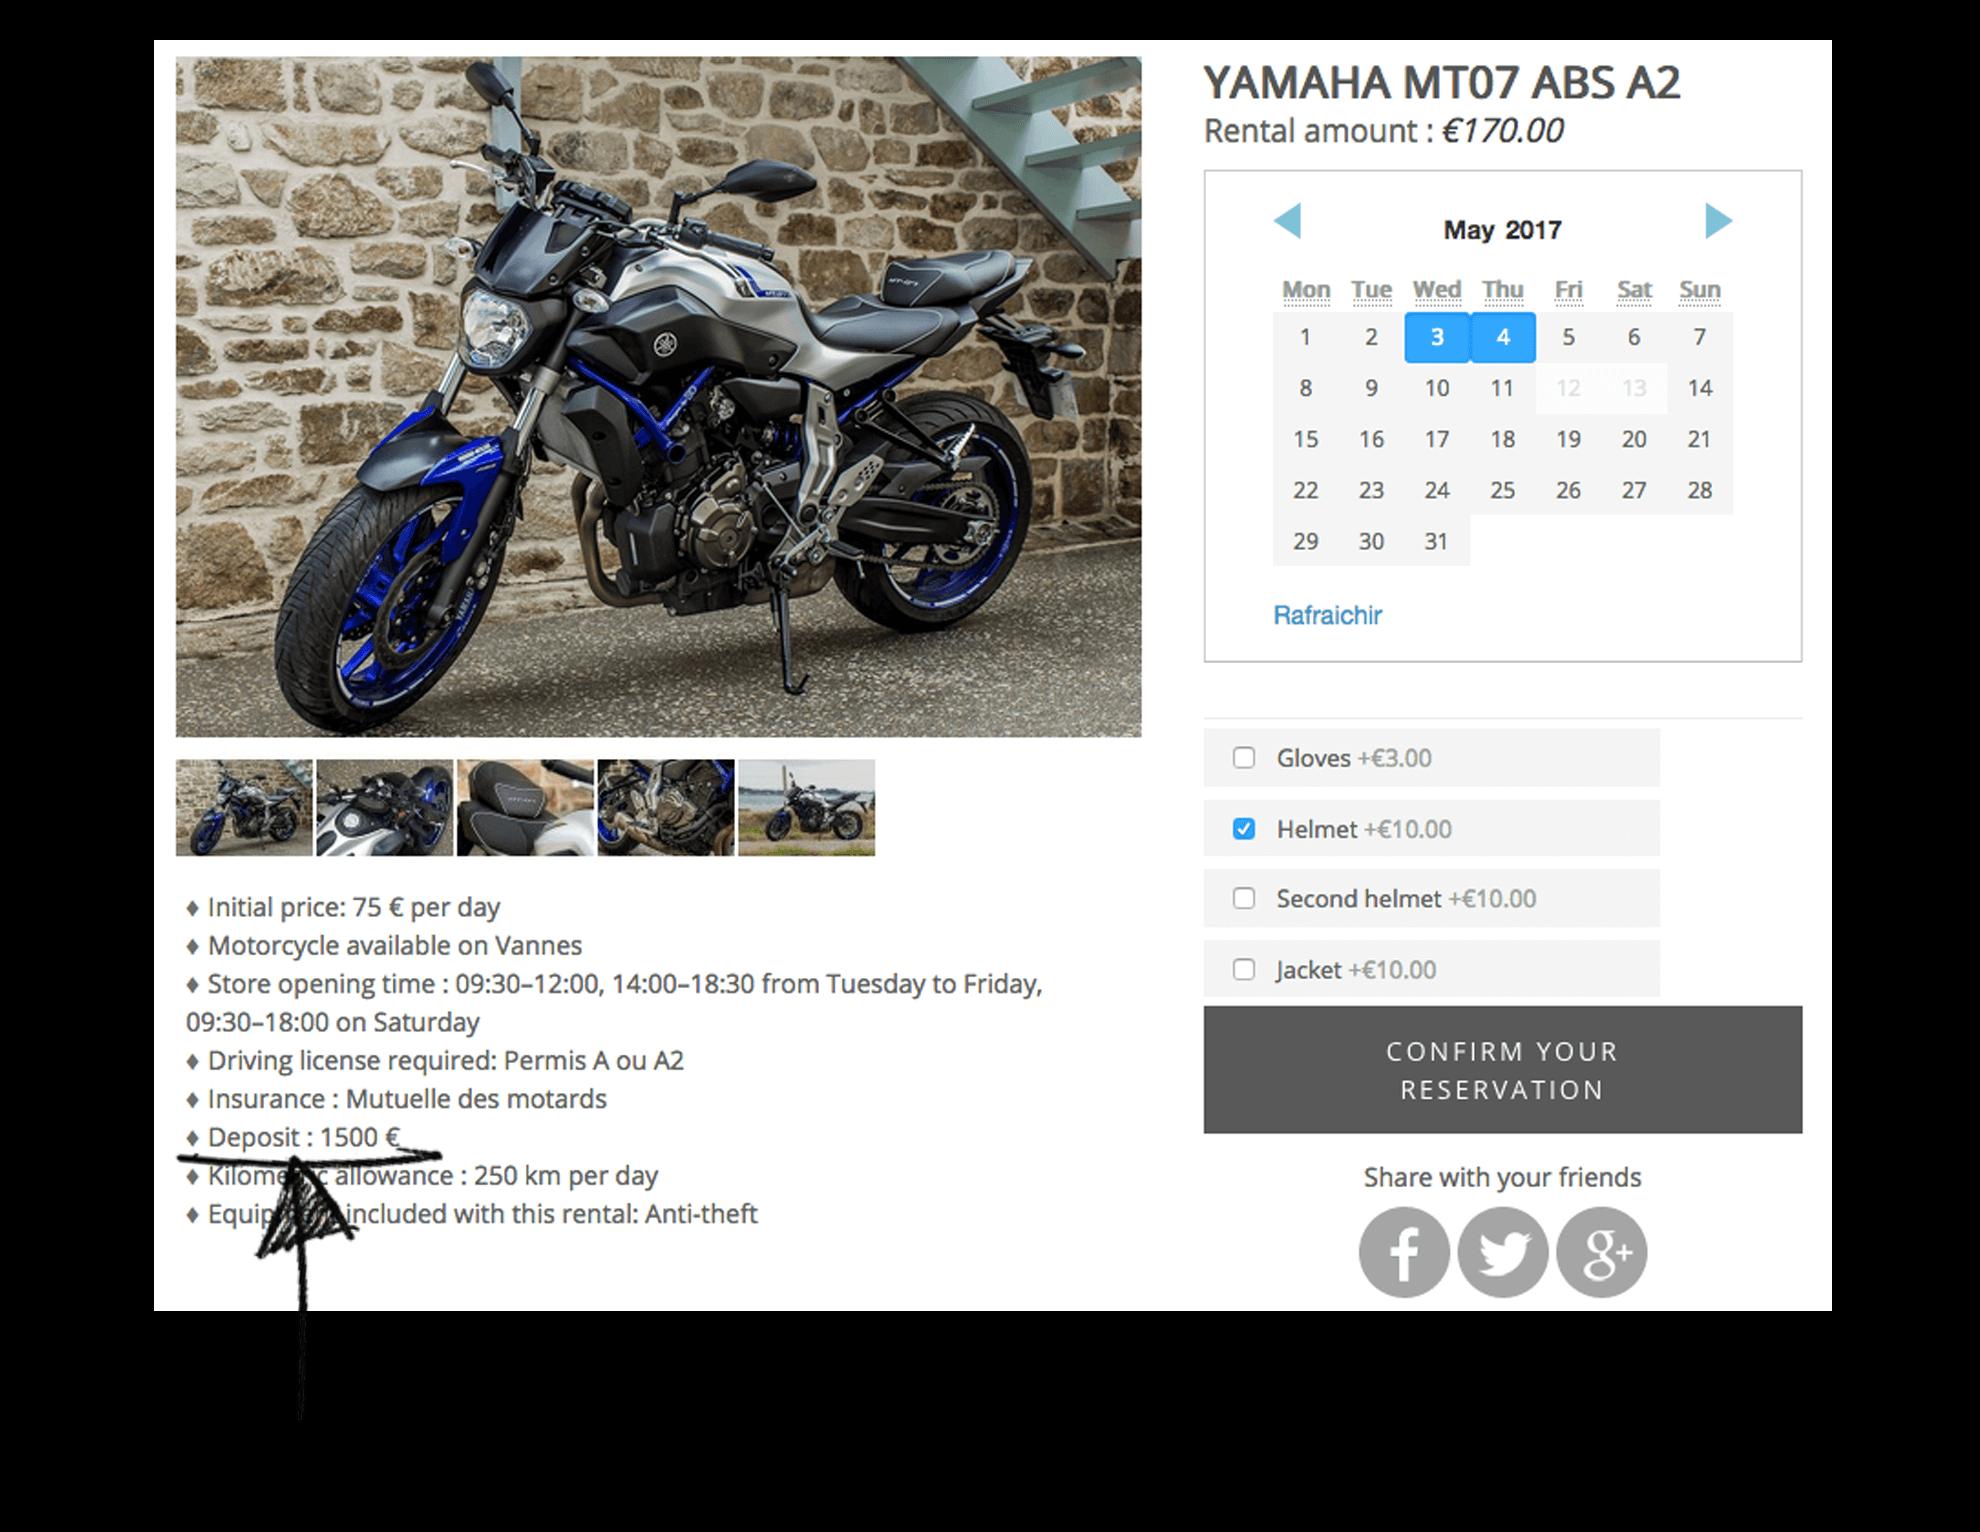 Deposite renting motorcyle